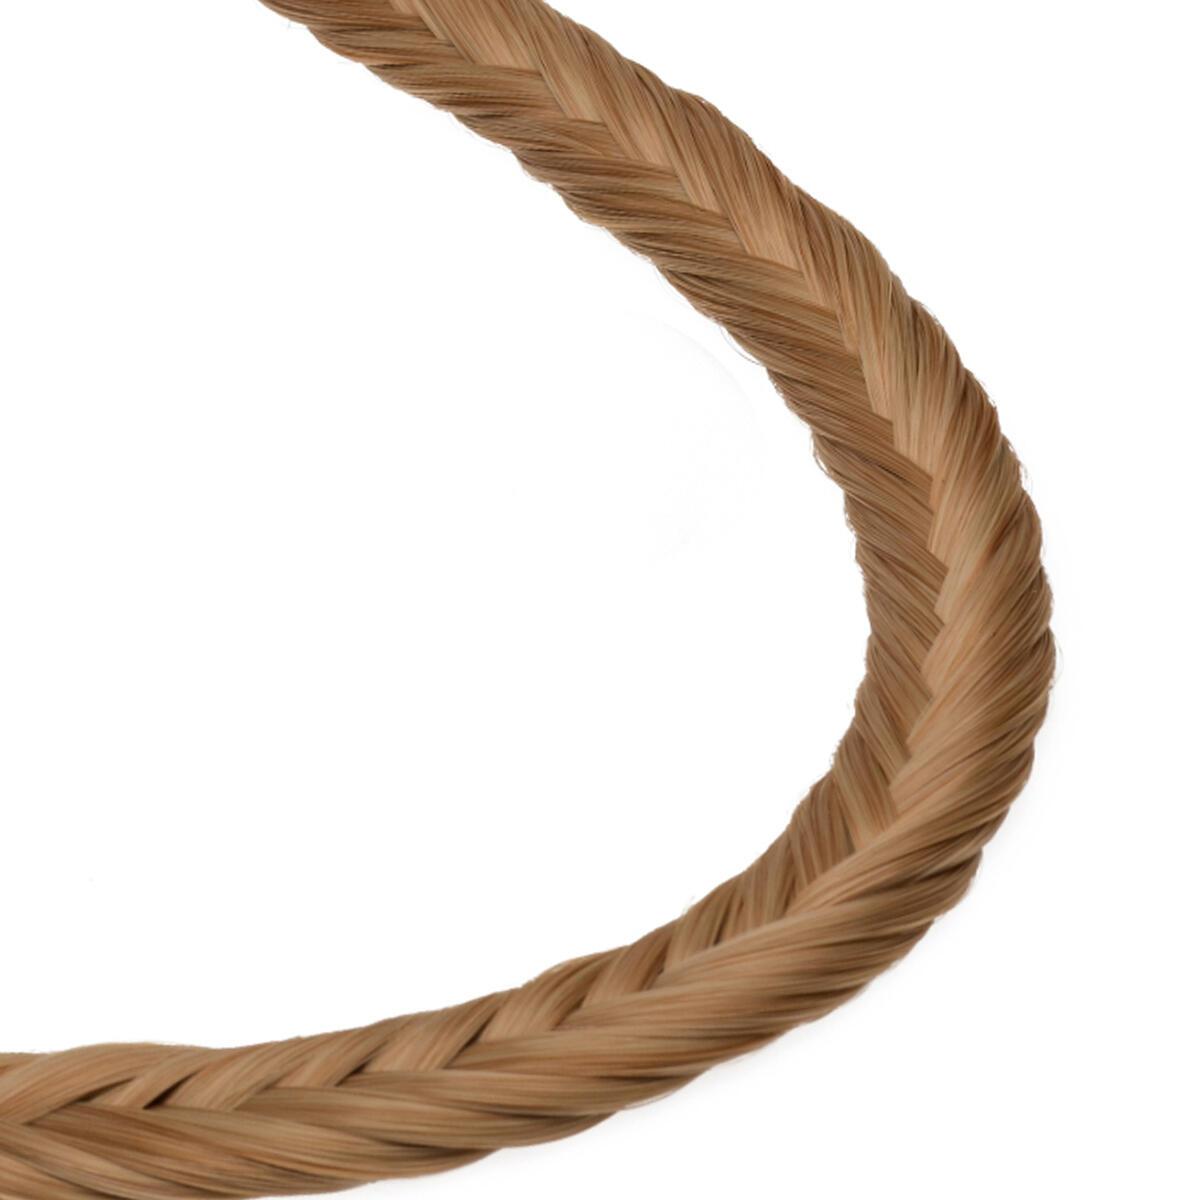 Synthetic Braided Headband 7.4 Medium Golden Blonde 0 cm